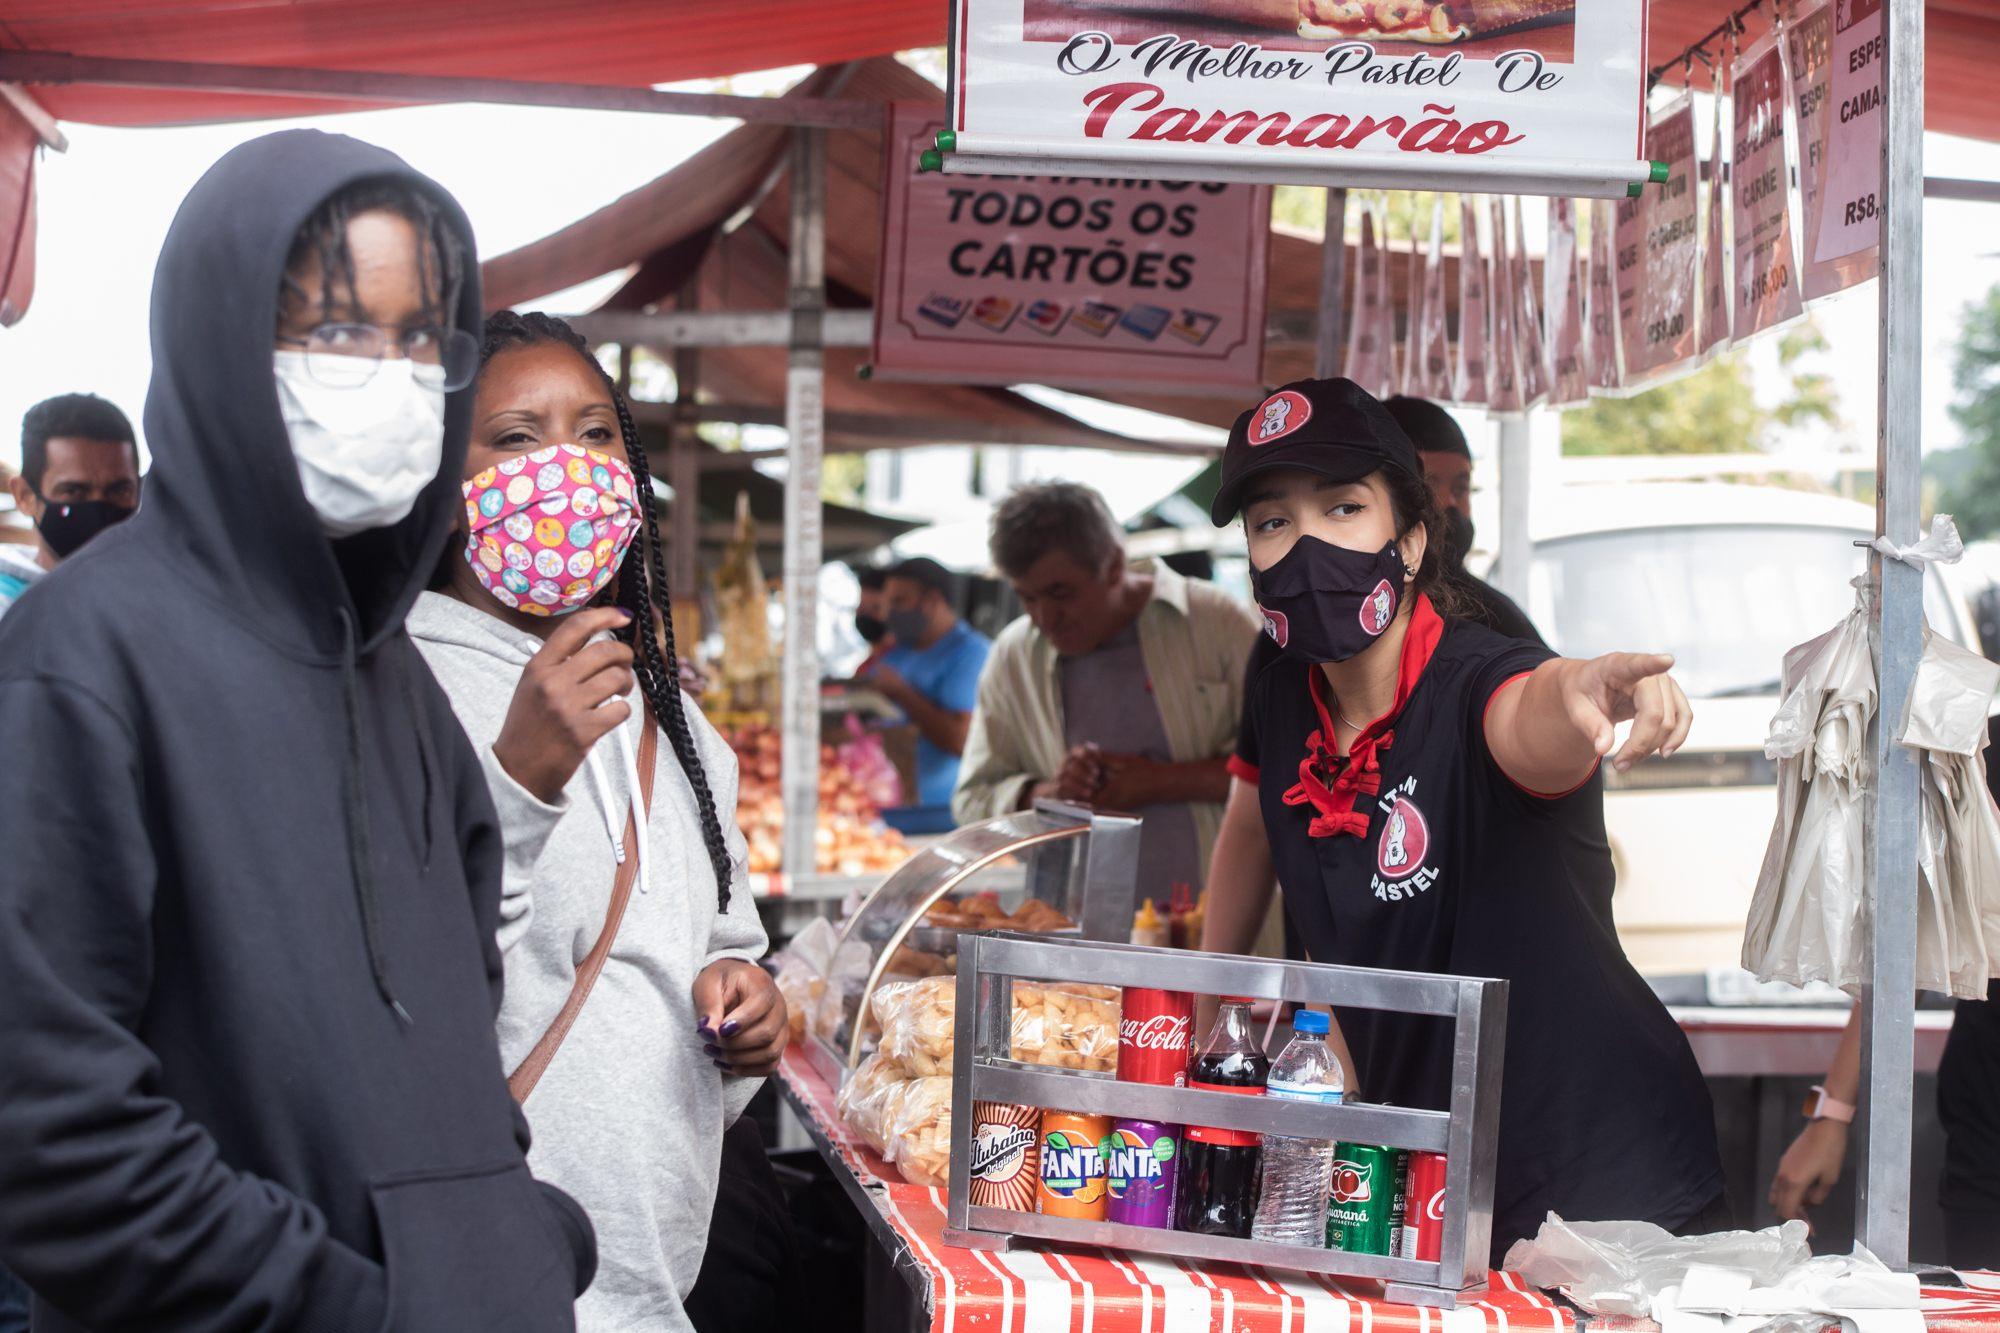 feirante itapecerica baixas-6787